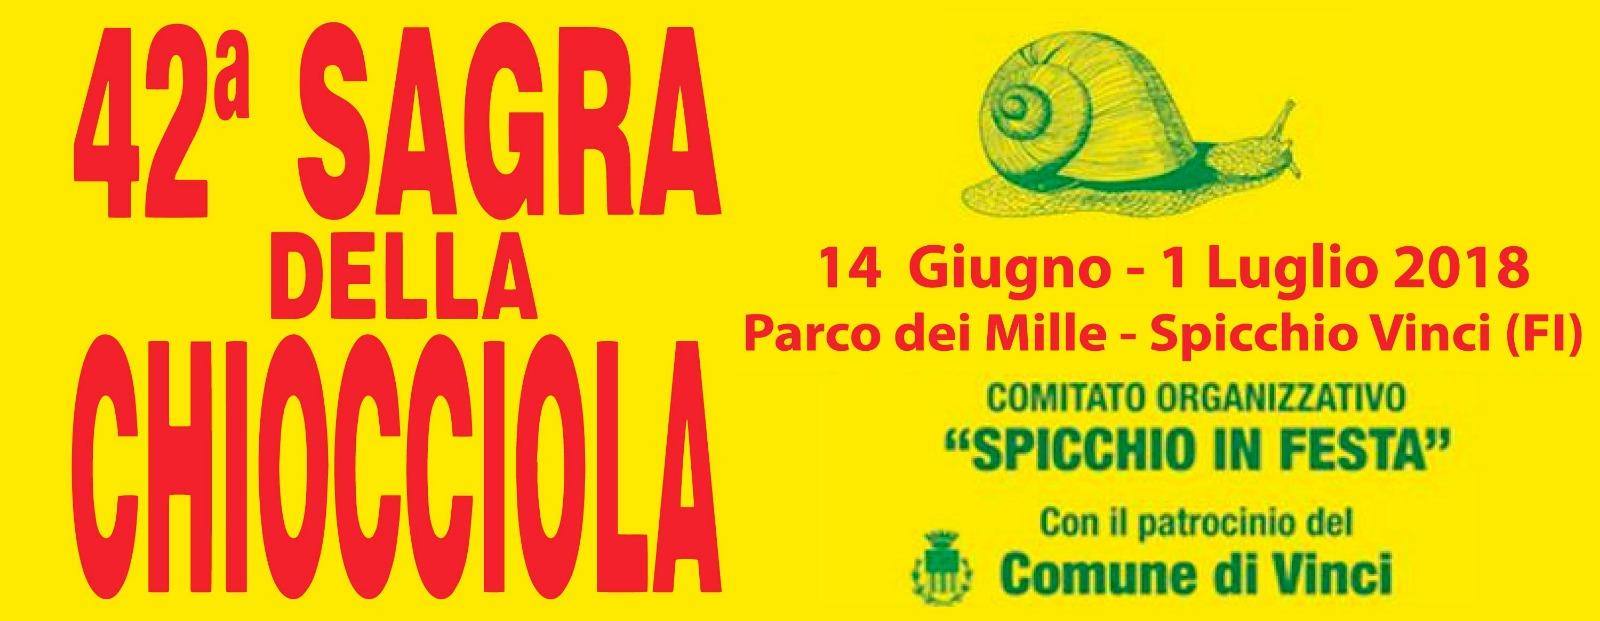 42^ SAGRA DELLA CHIOCCIOLA